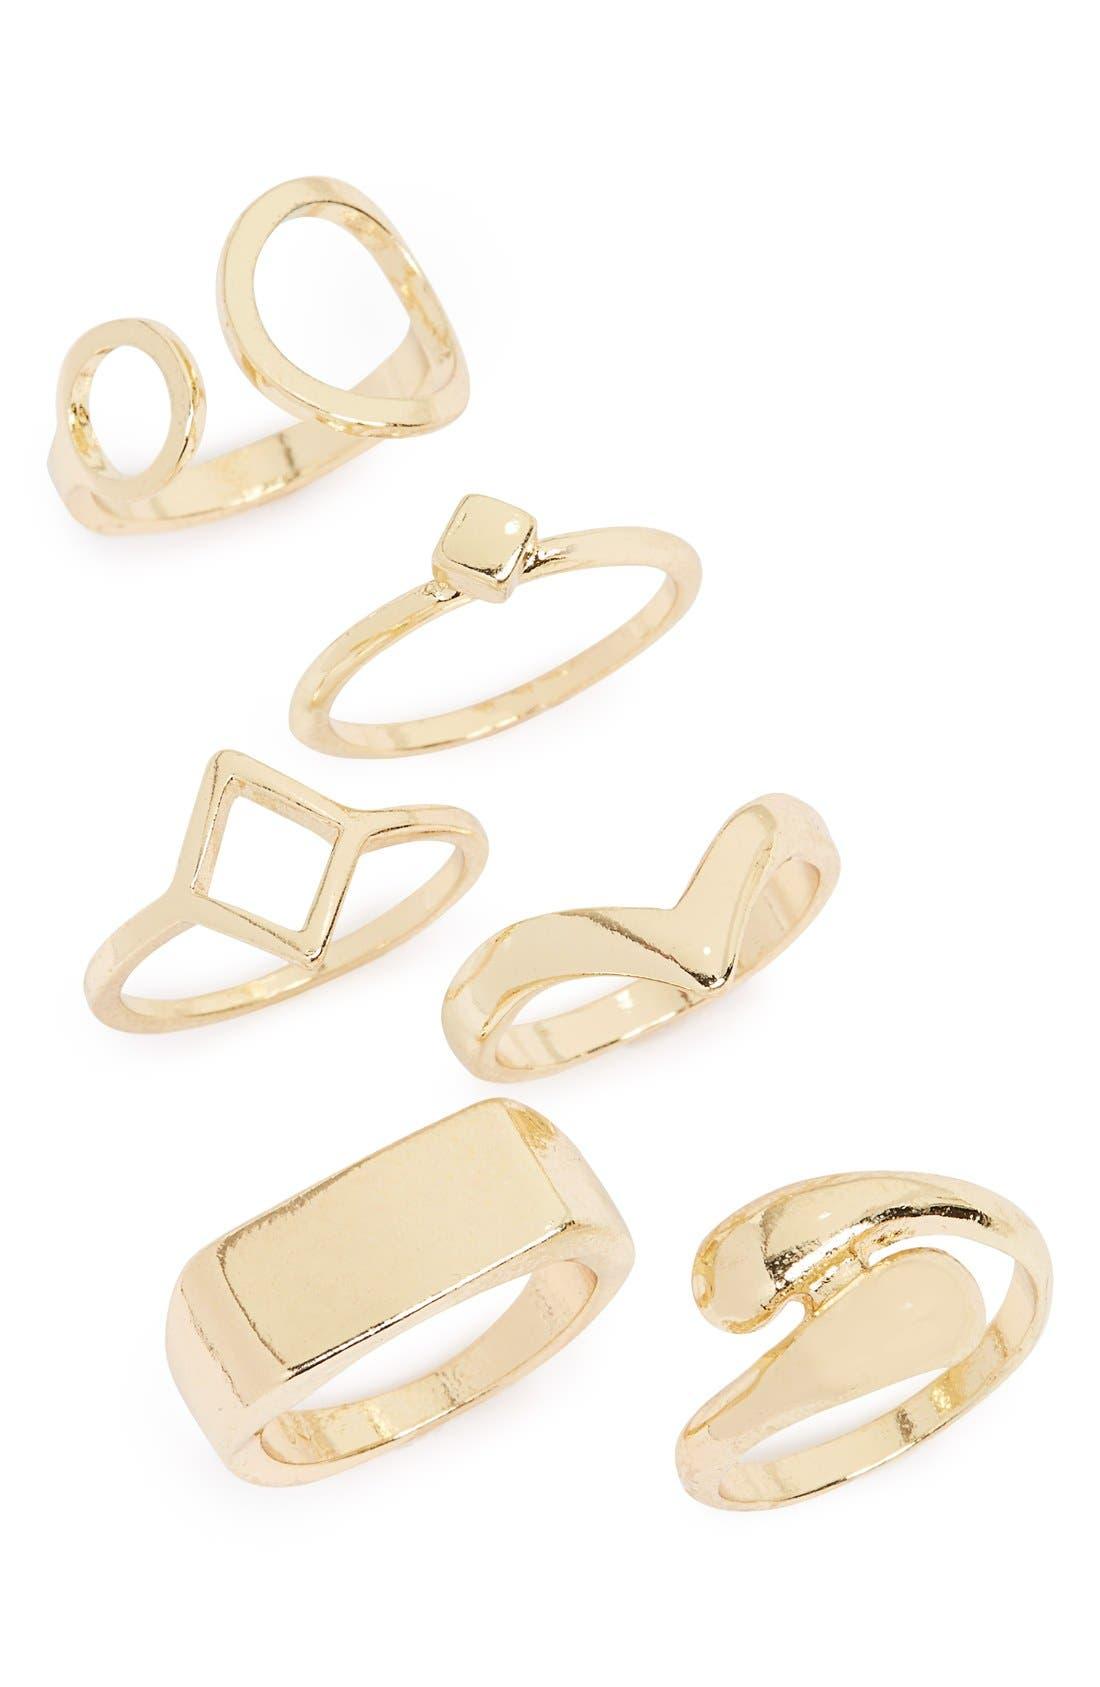 Alternate Image 1 Selected - Topshop Geometric Rings (Set of 6)